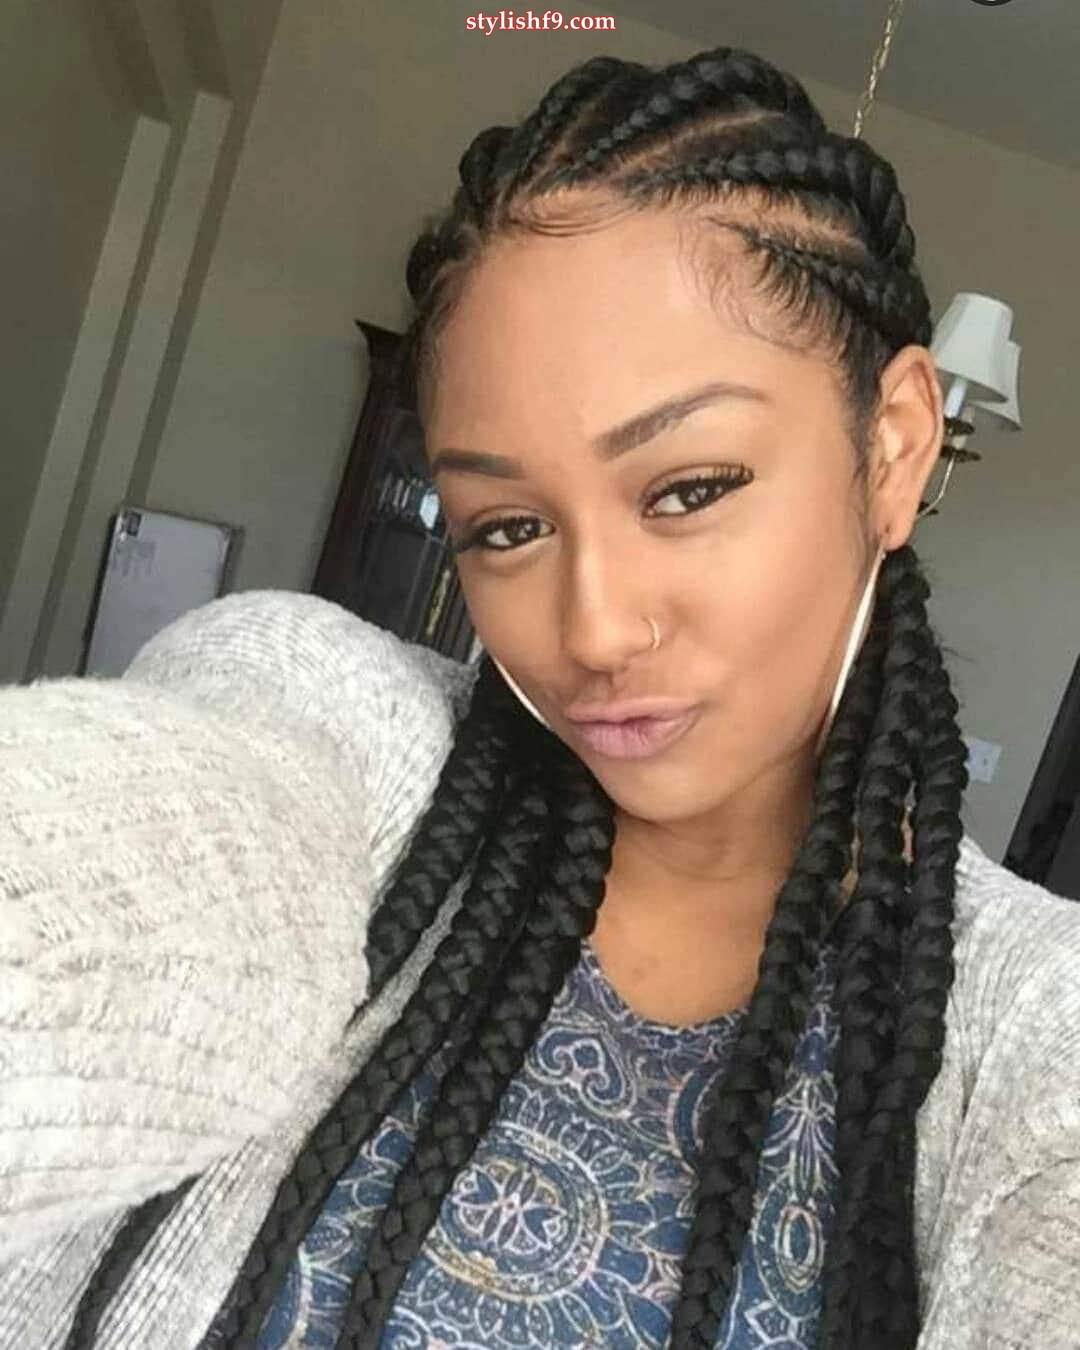 Rasta Braids Hairstyles: Best Cornrow Rasta Styles In 2019 • Stylish F9